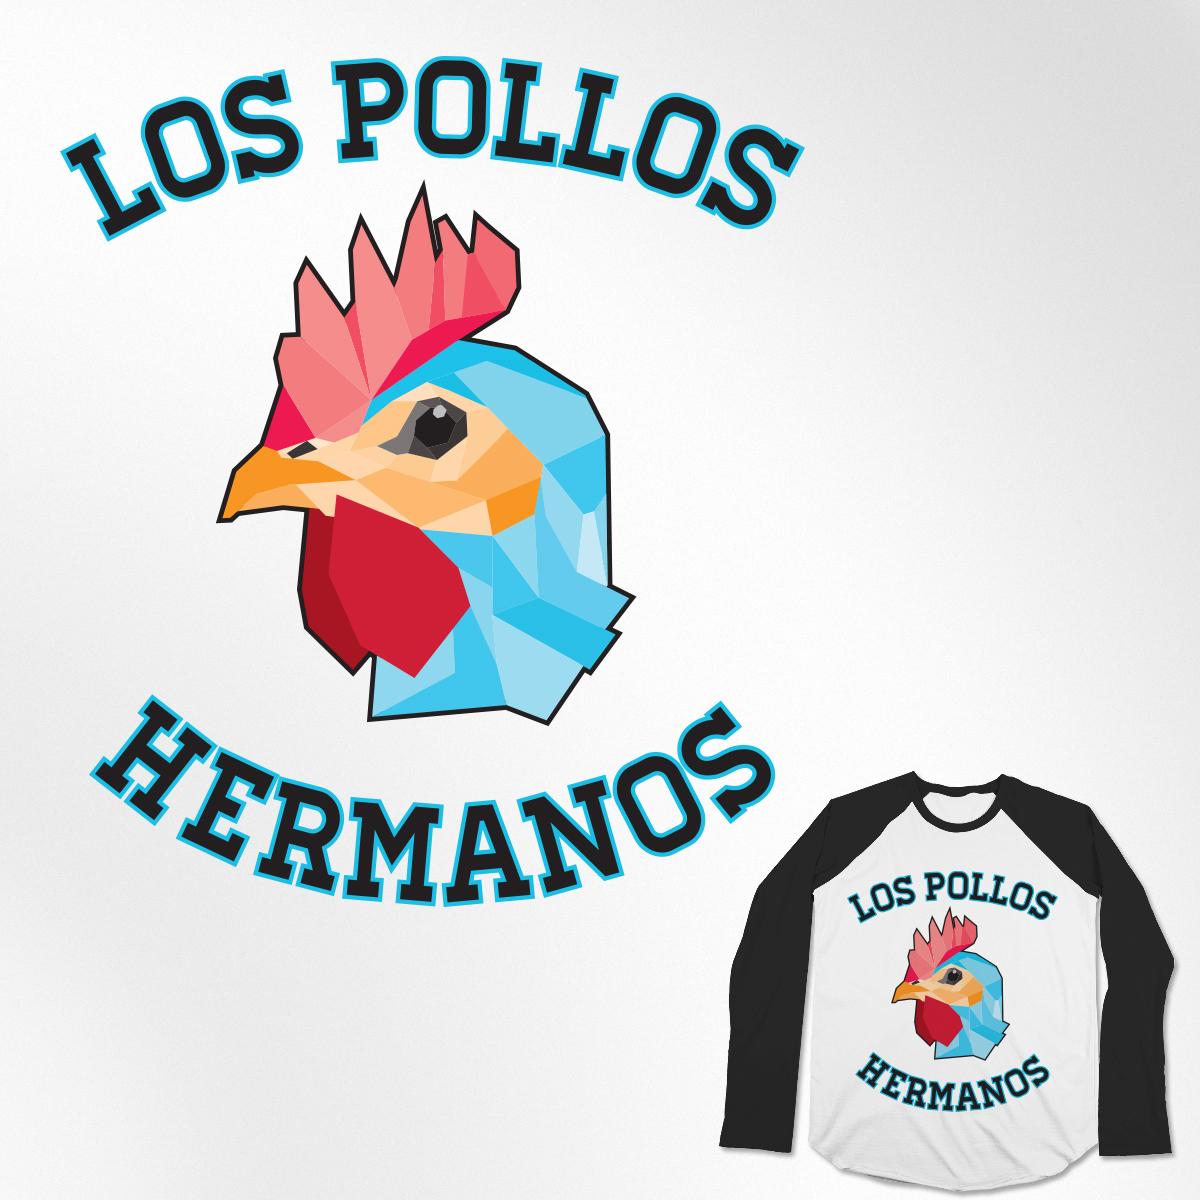 Los Pollos Hermanos by danielleevoigt on Threadless